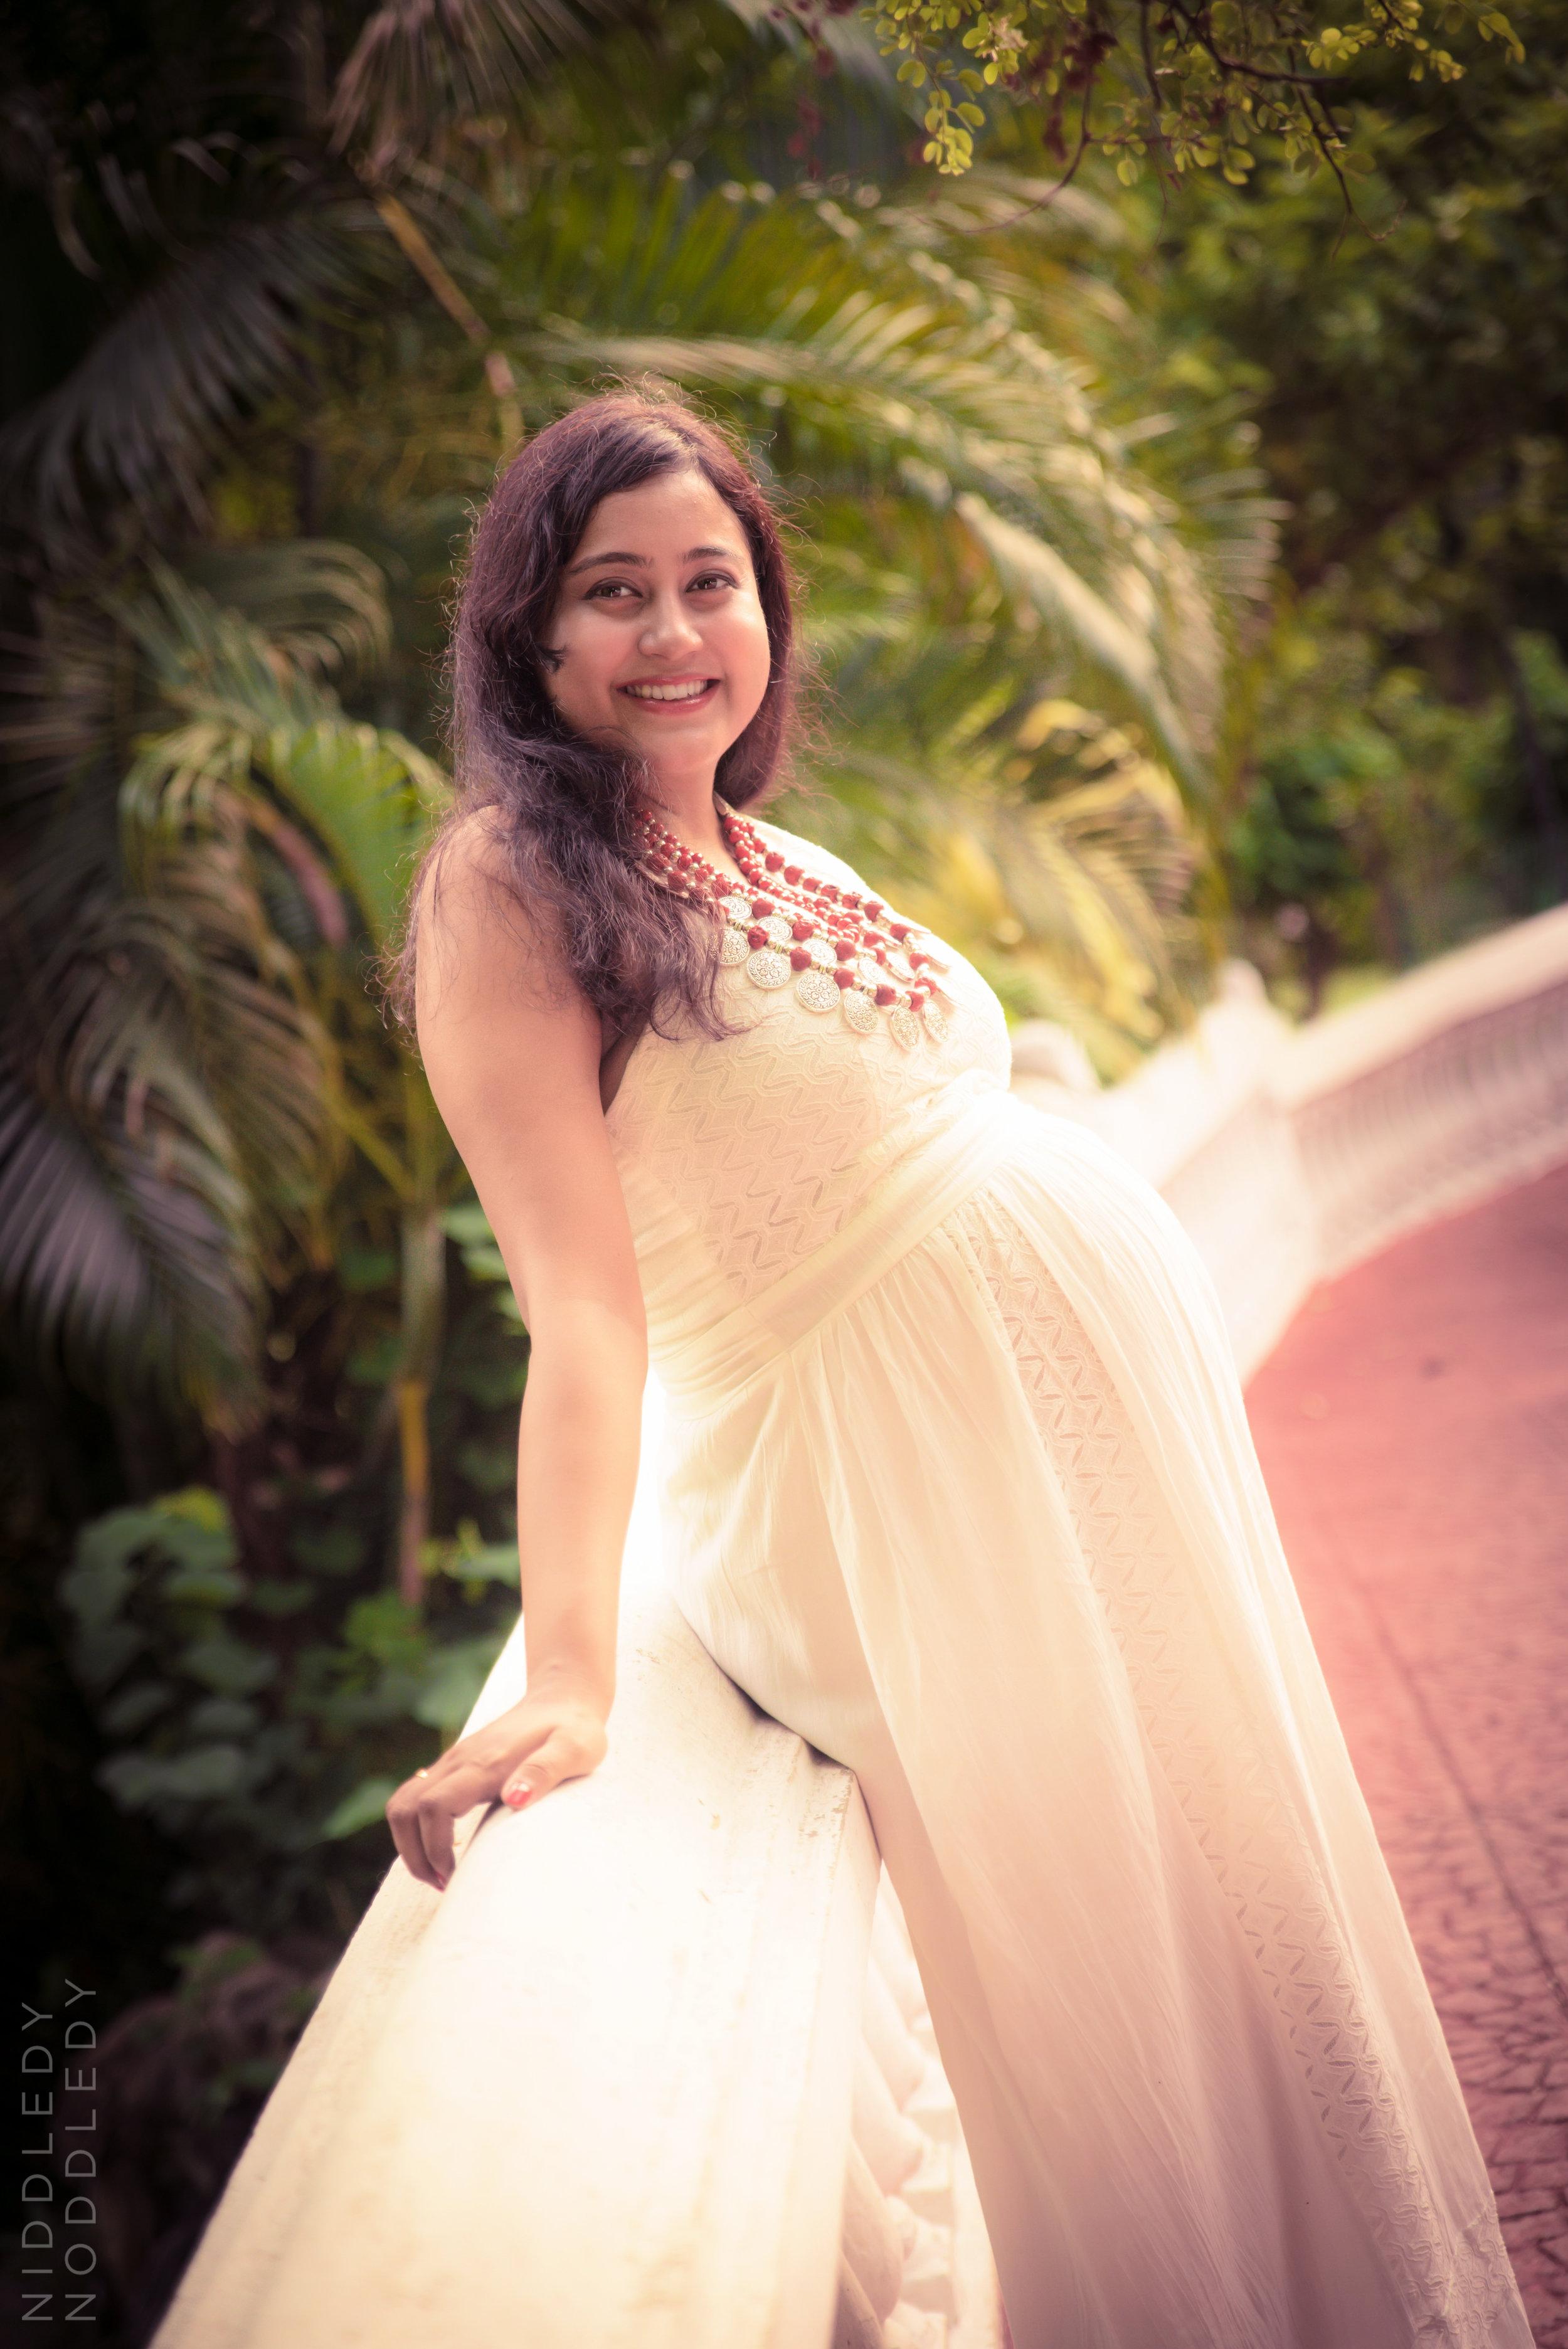 Monalisa Maternity Photoshoot ❤ NiddledyNoddledy.com ~ Bumps to Babies Photography, Kolkata - 07.jpg